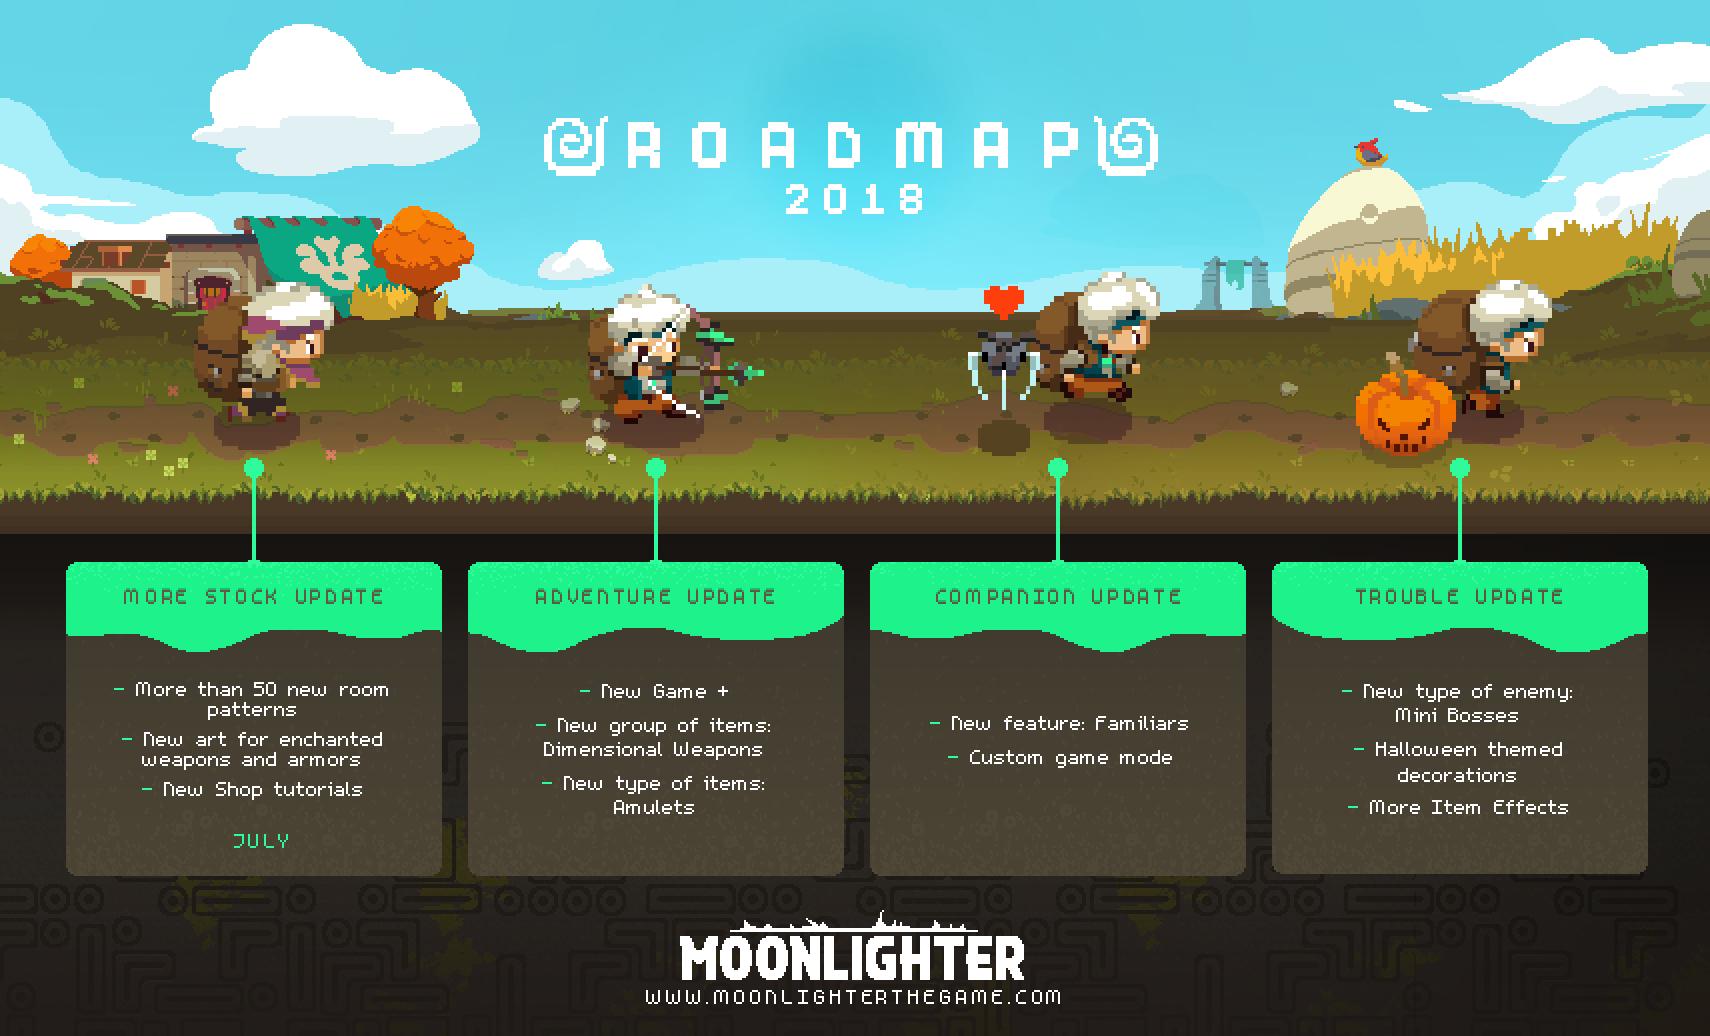 Moonlighter - 2018 Development Roadmap